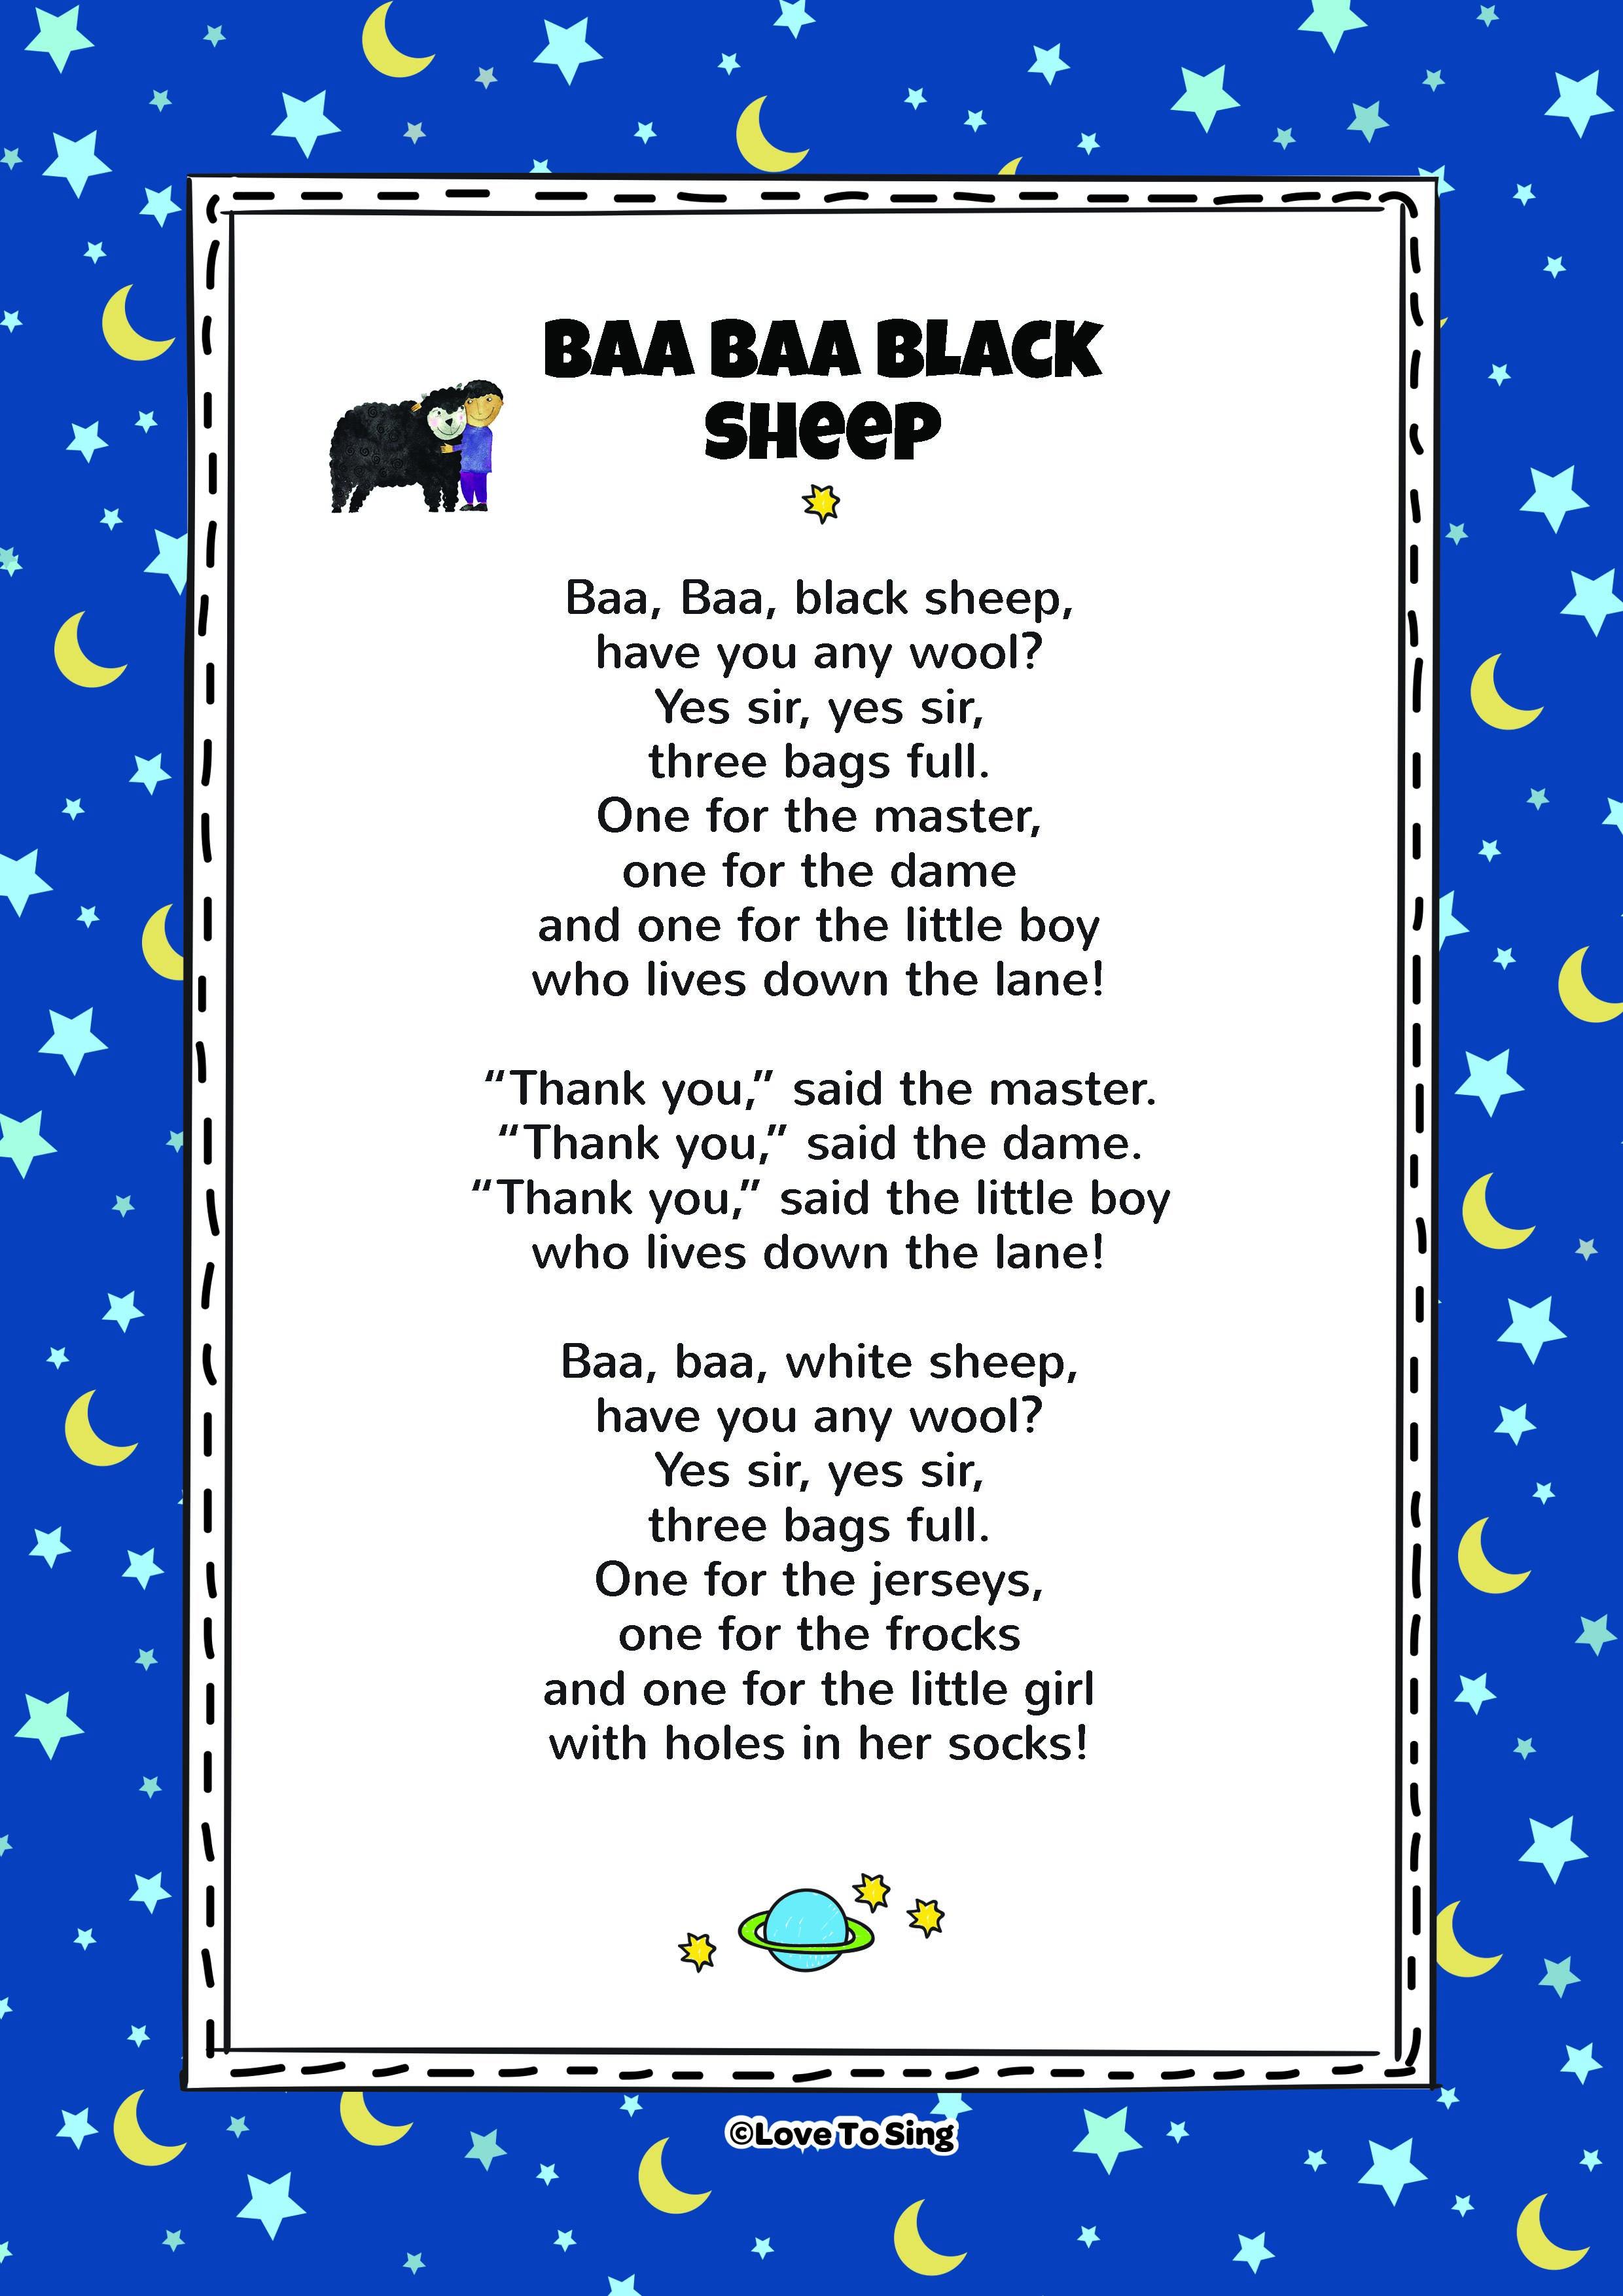 baa baa black sheep lyrics video free download